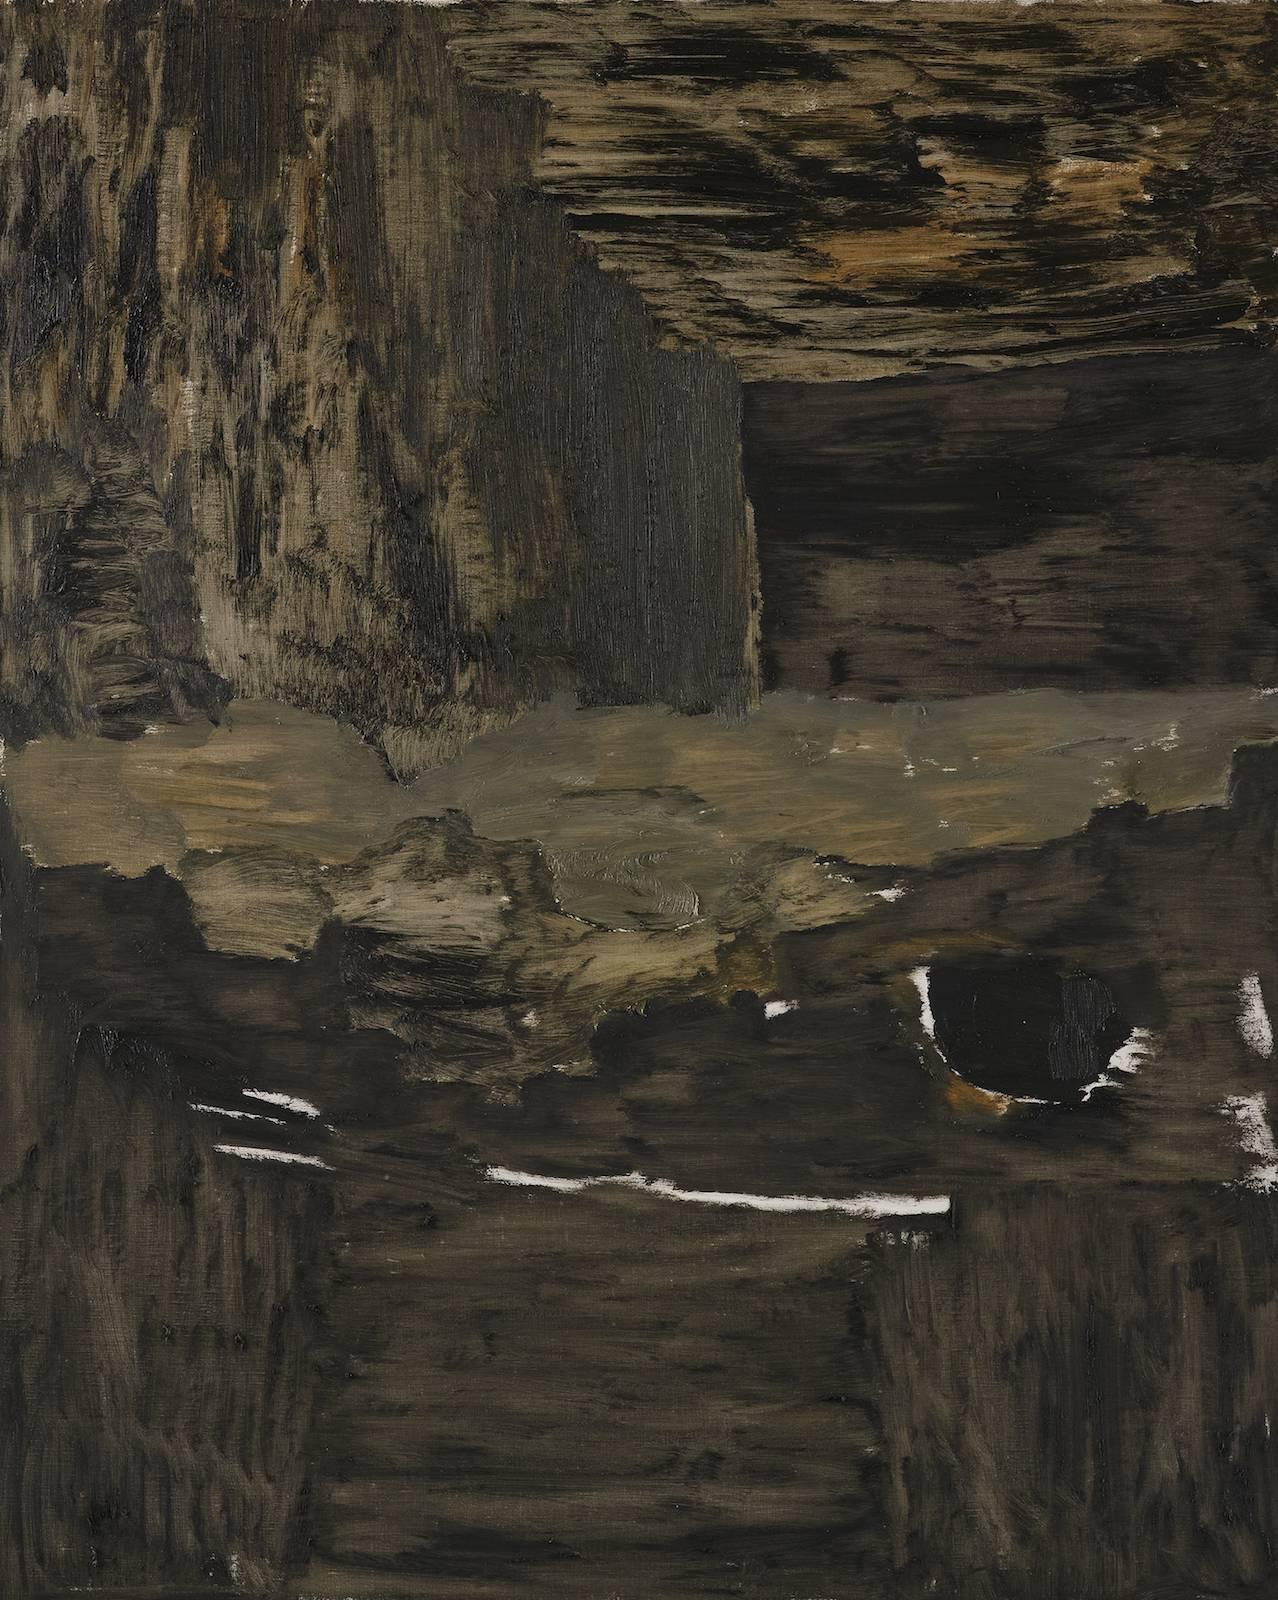 Landskap 4, 2012, oil on canvas, 75 x 60 cm